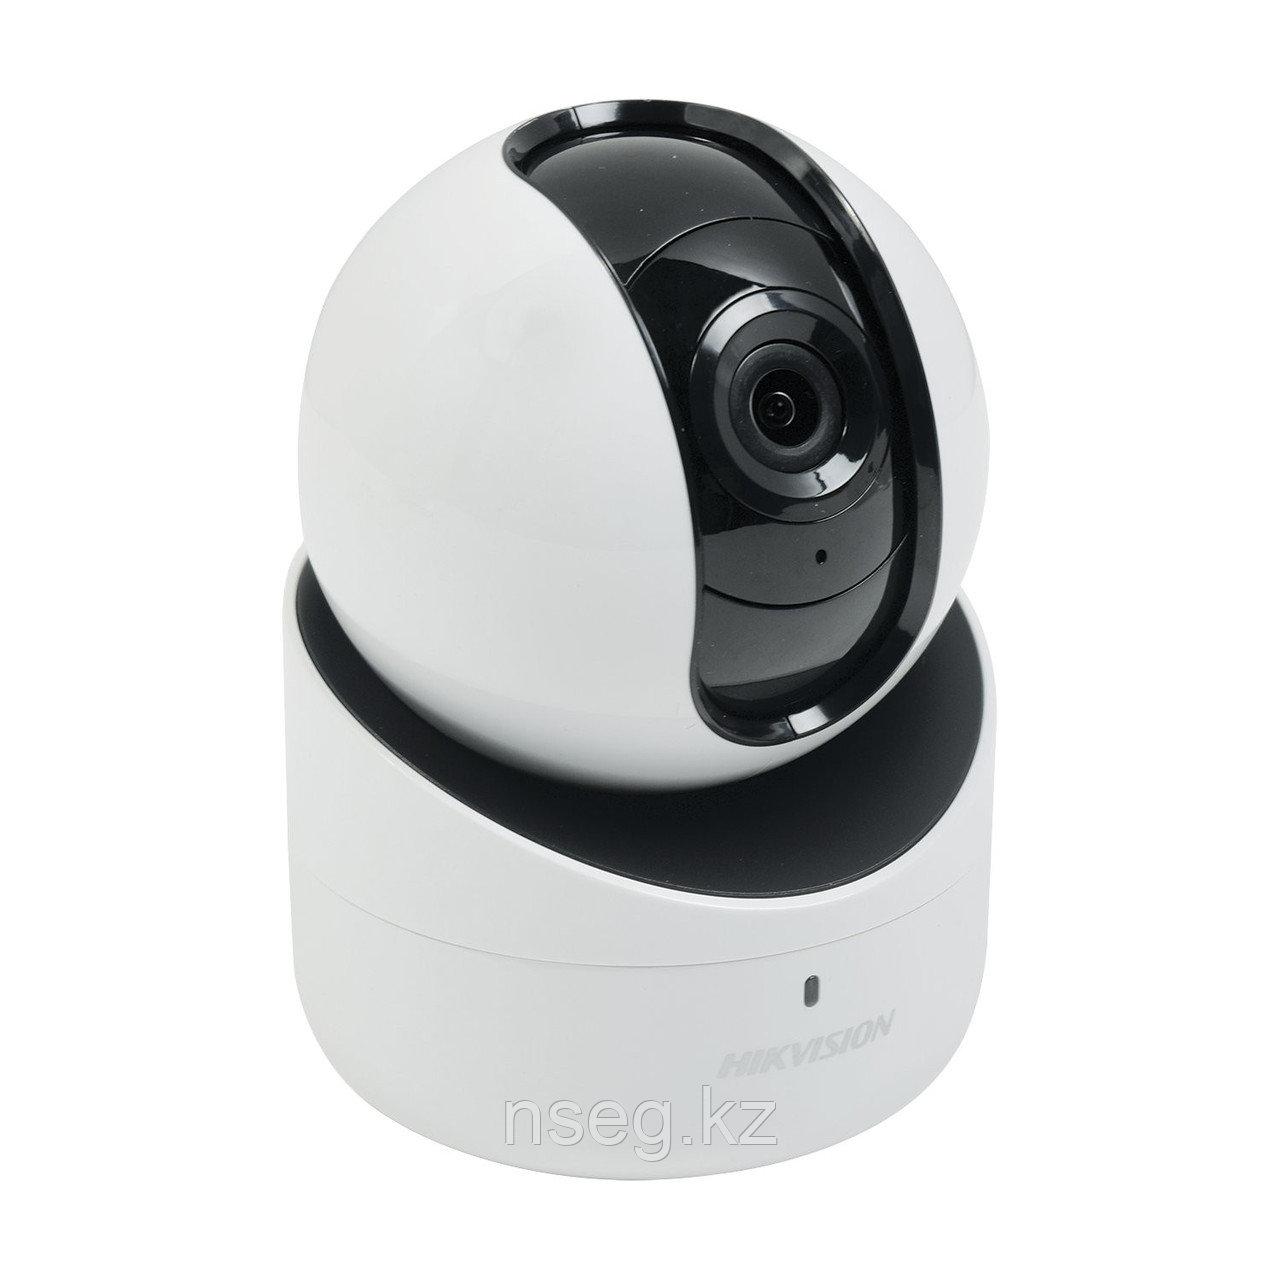 2Мп поворотная IP камера Hikvision DS-2CV2Q21FD-IW/64GB-T